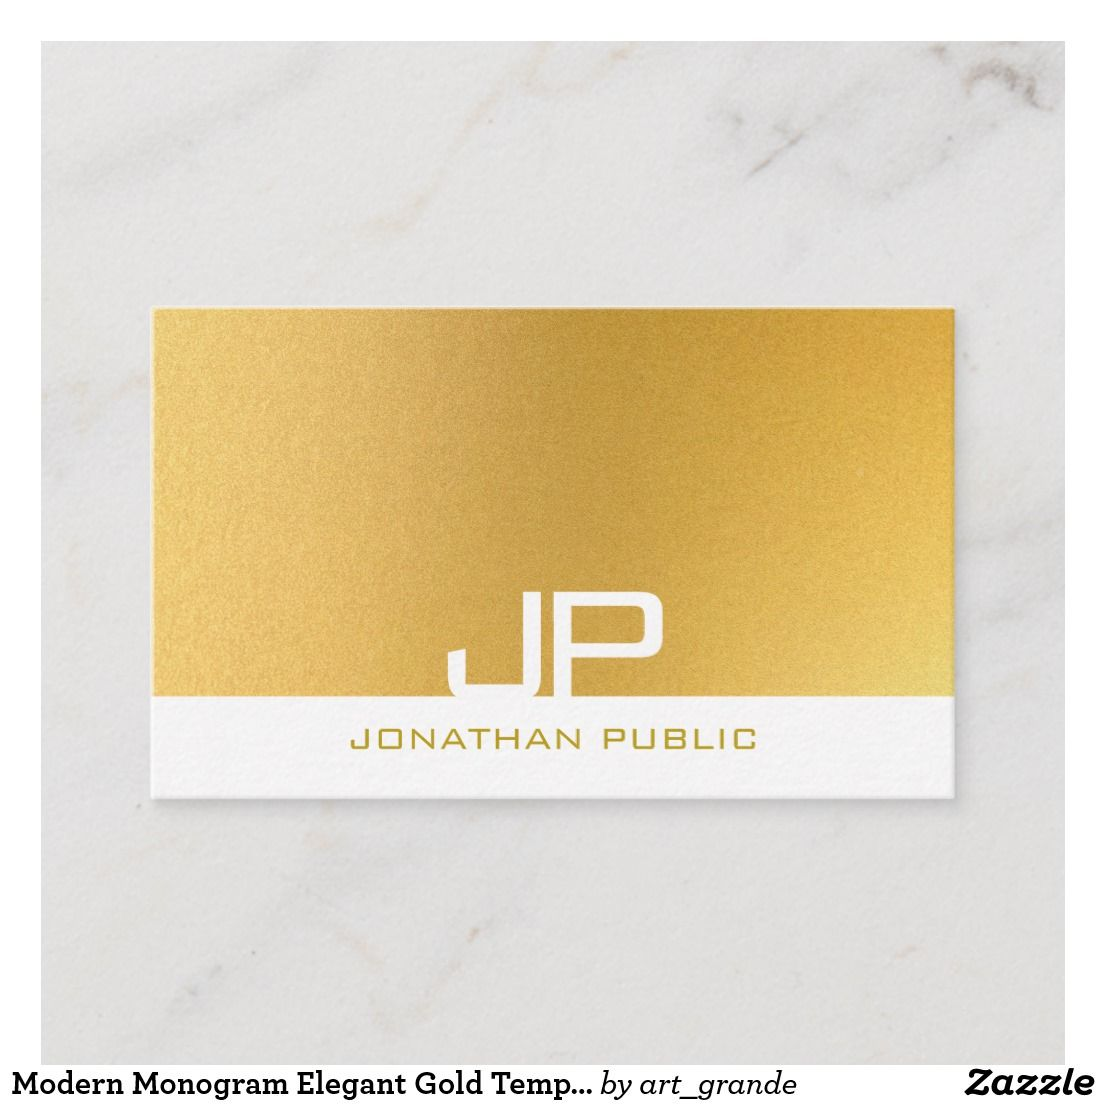 Modern Monogram Elegant Gold Template Professional Business